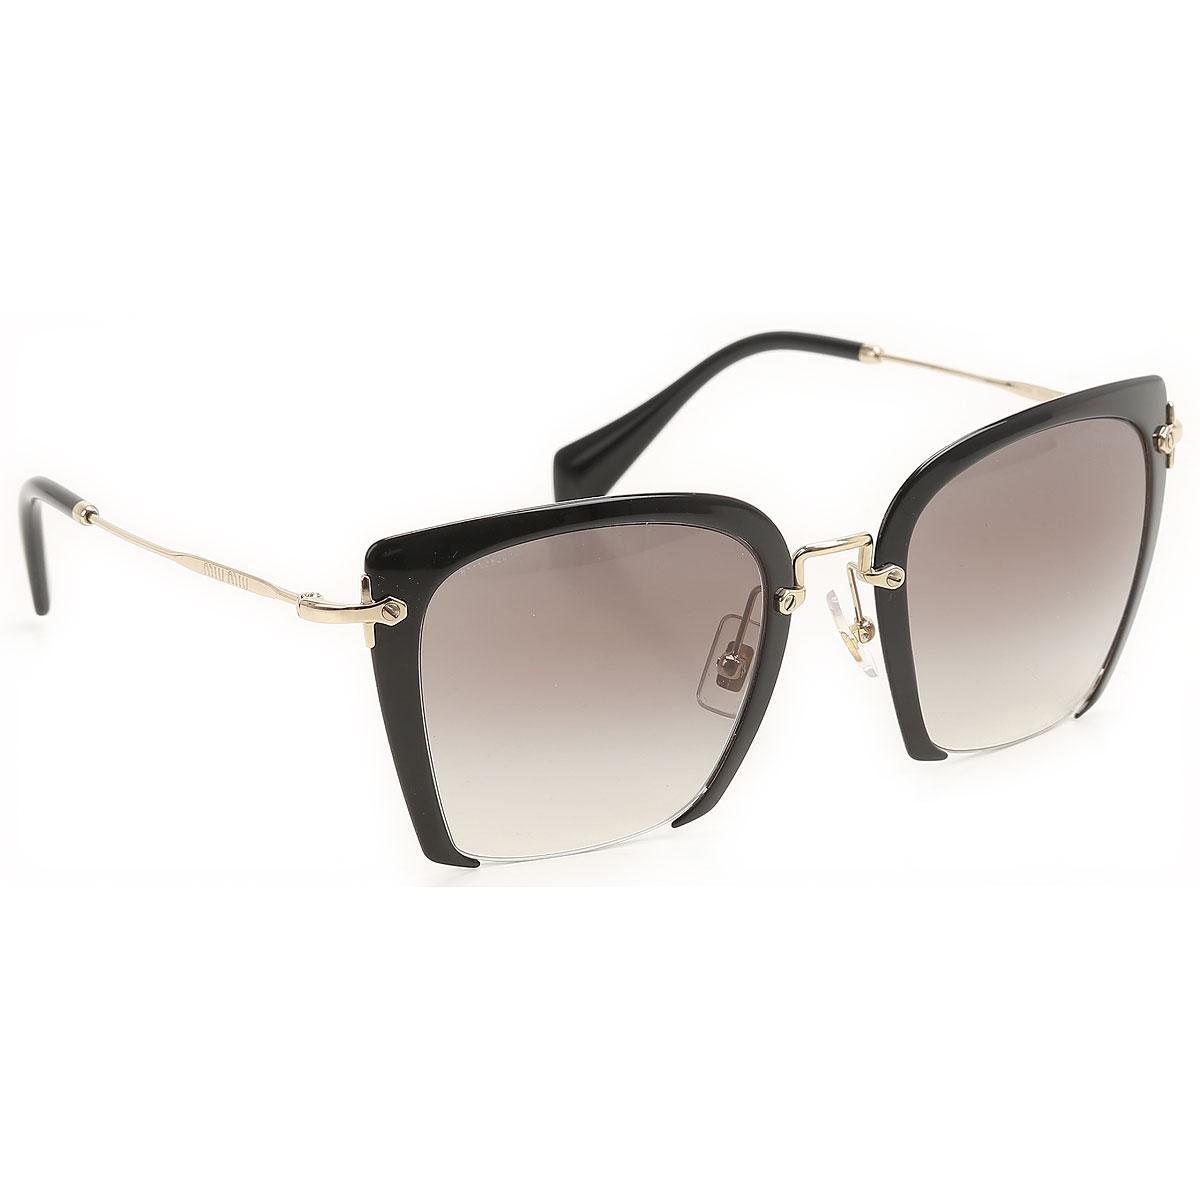 lunettes de soleil miu miu code produit smu52r 1ab 0a7. Black Bedroom Furniture Sets. Home Design Ideas